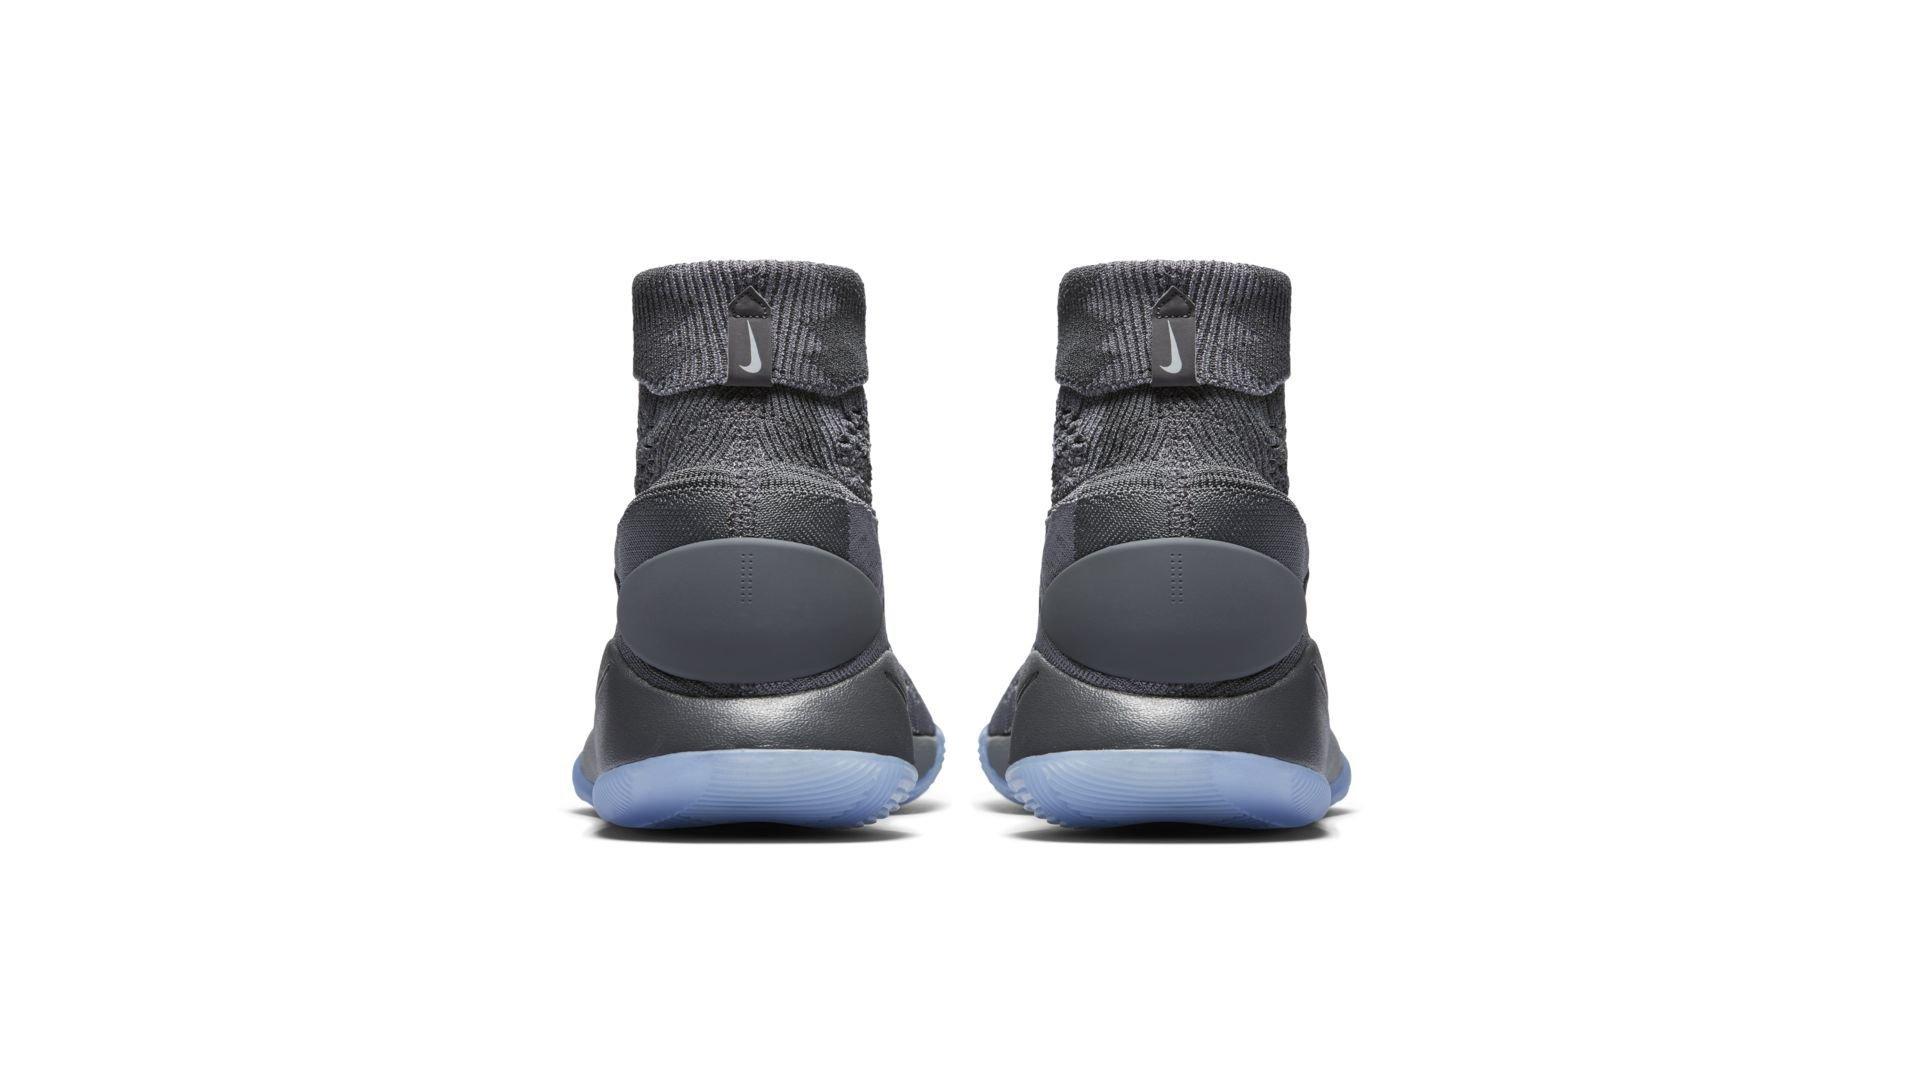 Nike Hyperdunk 2016 Flyknit Dark Grey (843390-002)